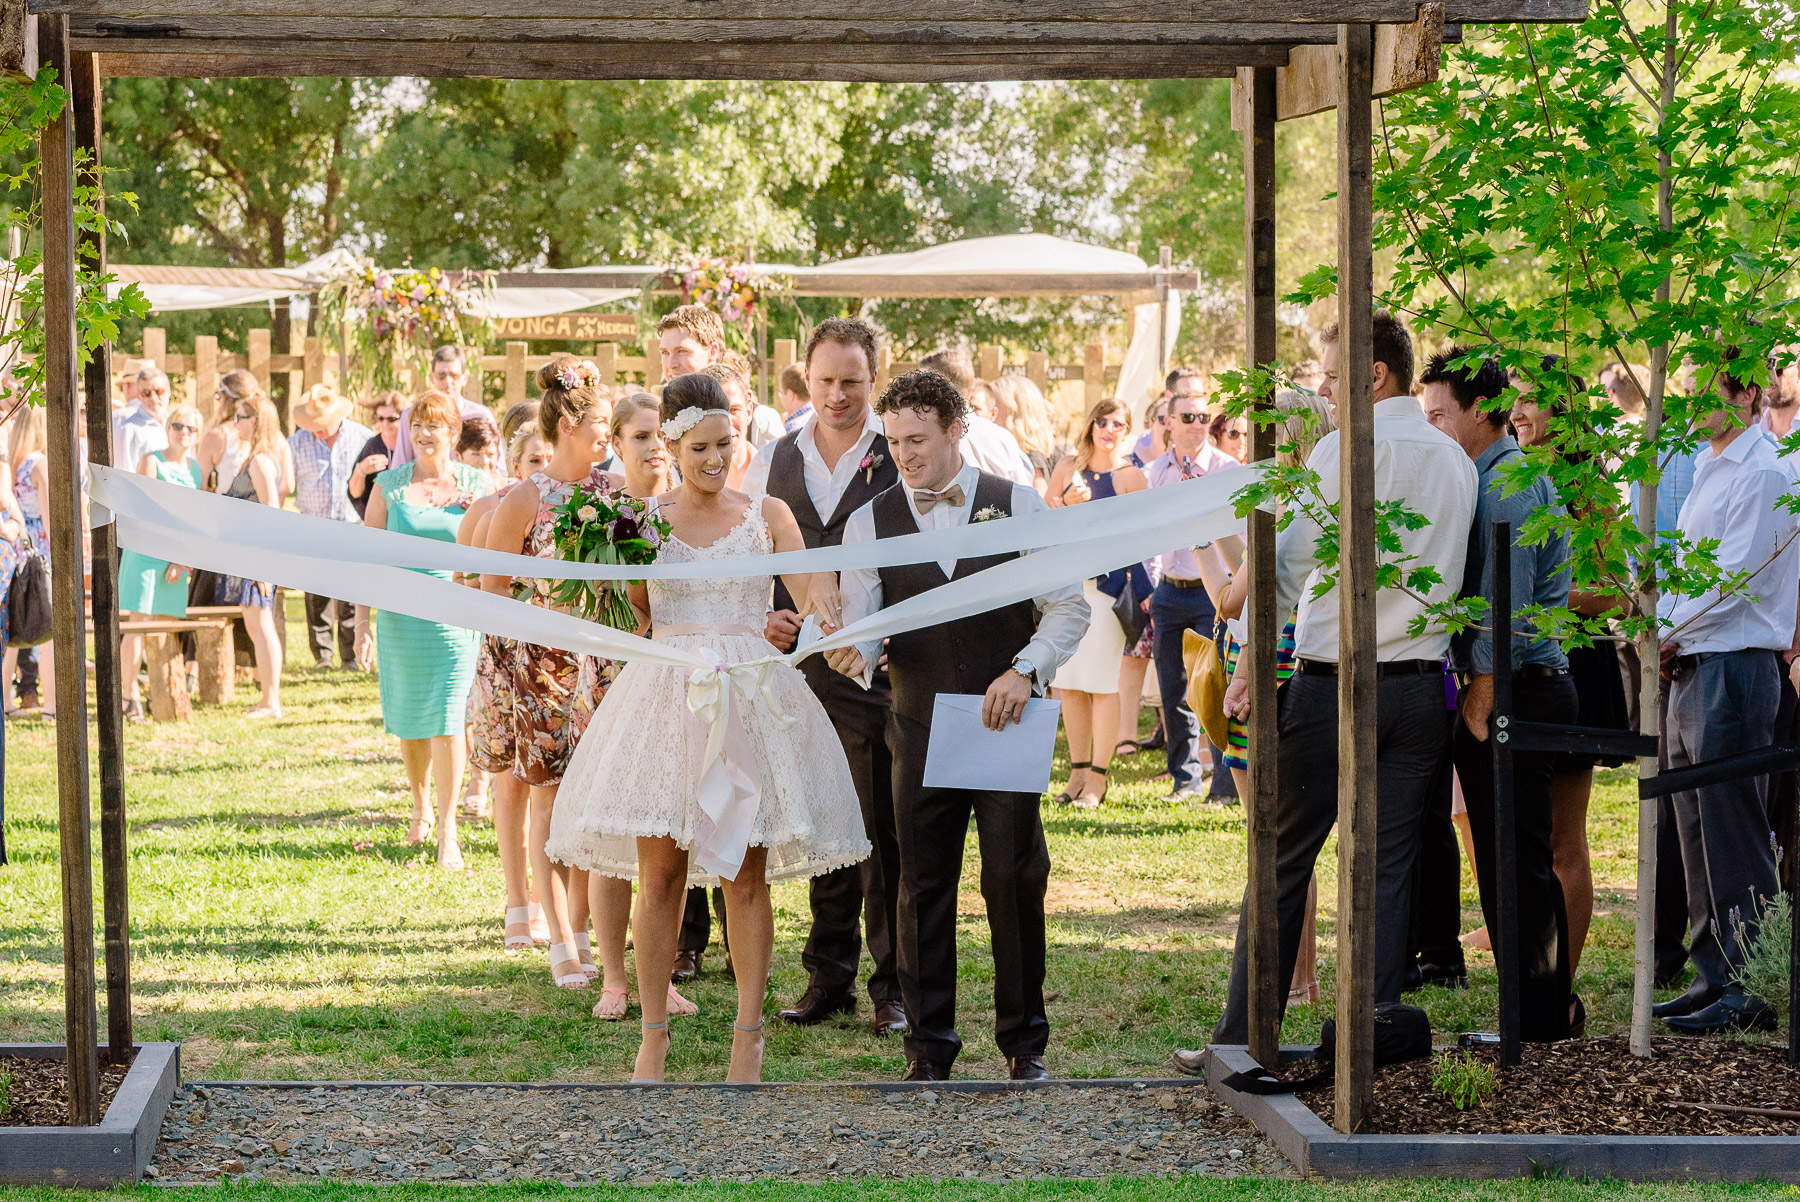 Melissa_and_Kristan_Echuca_Farm_Wedding_New_Years_Eve-74.jpg